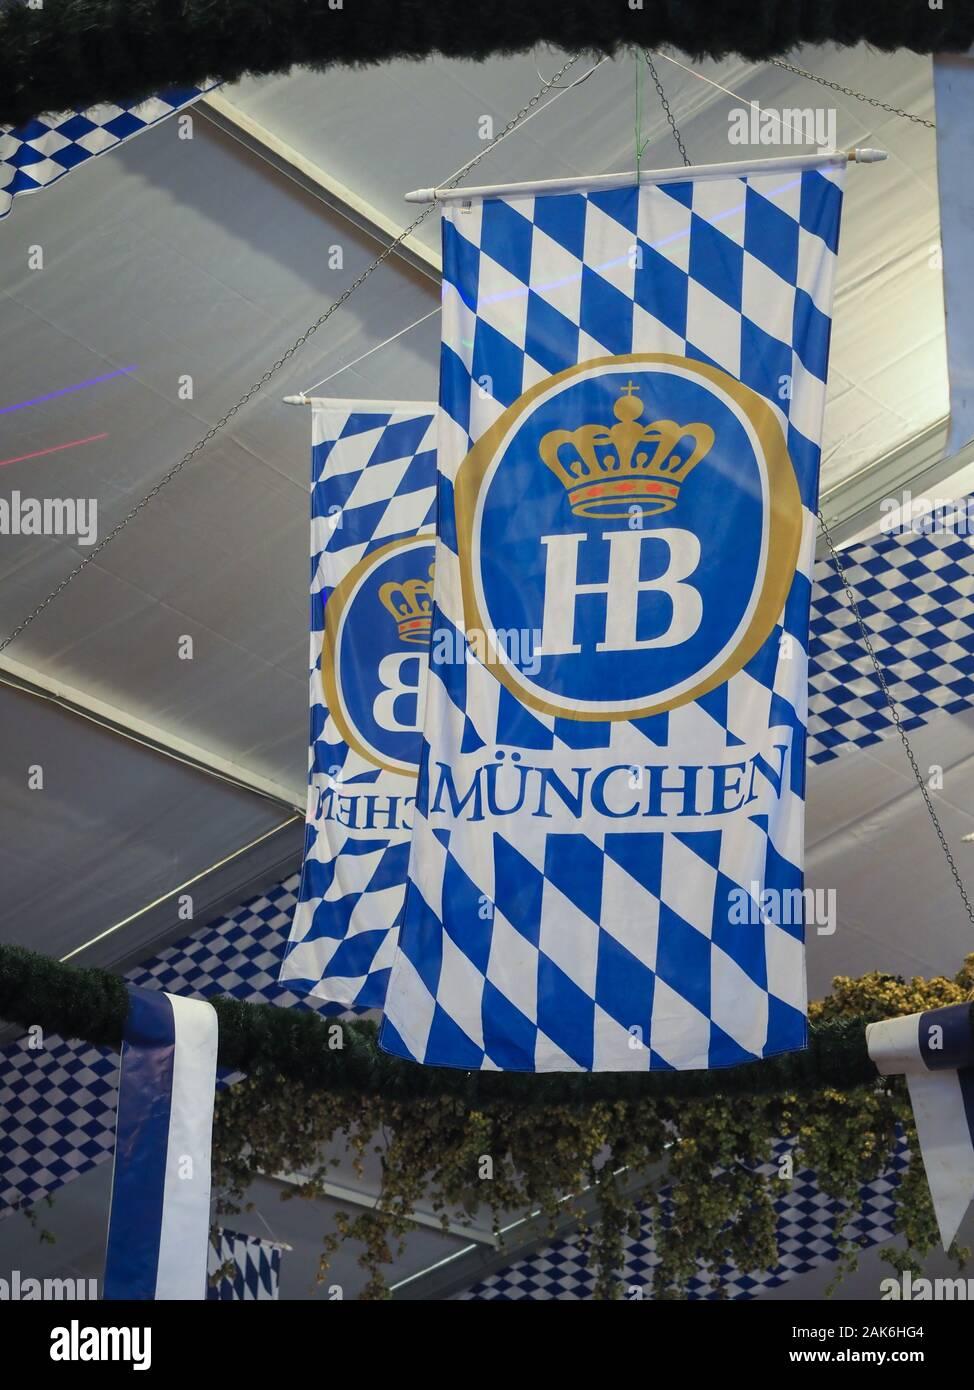 Munich, Allemagne - CIRCA Octobre 2019: Hofbraeu beer sign Banque D'Images